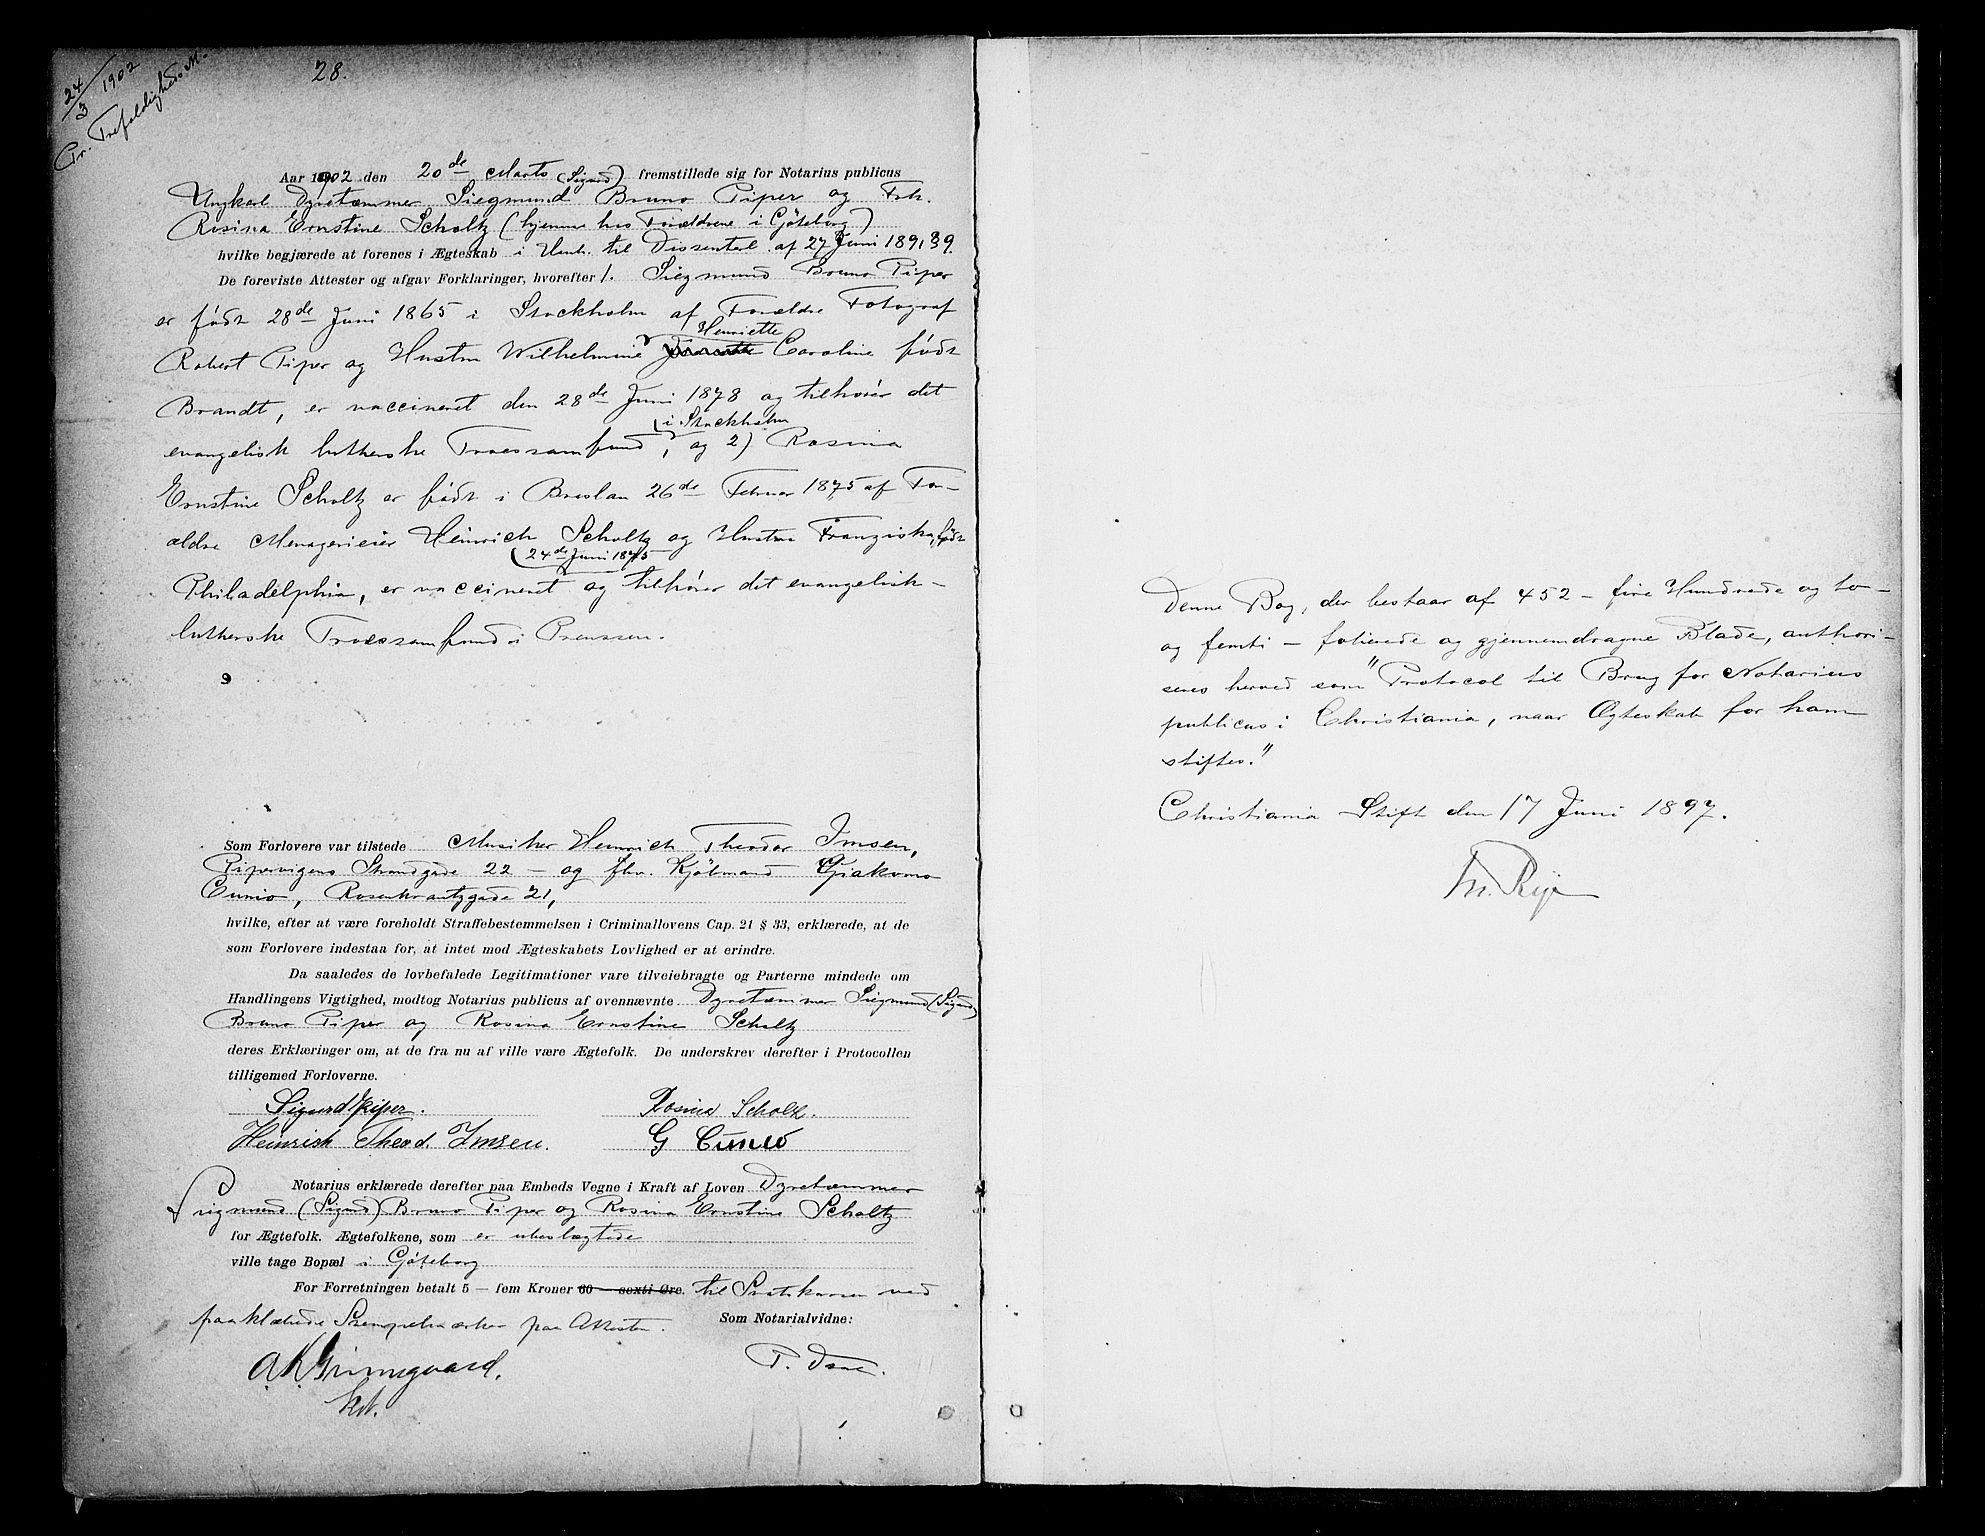 SAO, Oslo byfogd avd. I, L/Lb/Lbb/L0004: Notarialprotokoll, rekke II: Vigsler, 1897-1902, s. 452b-453a